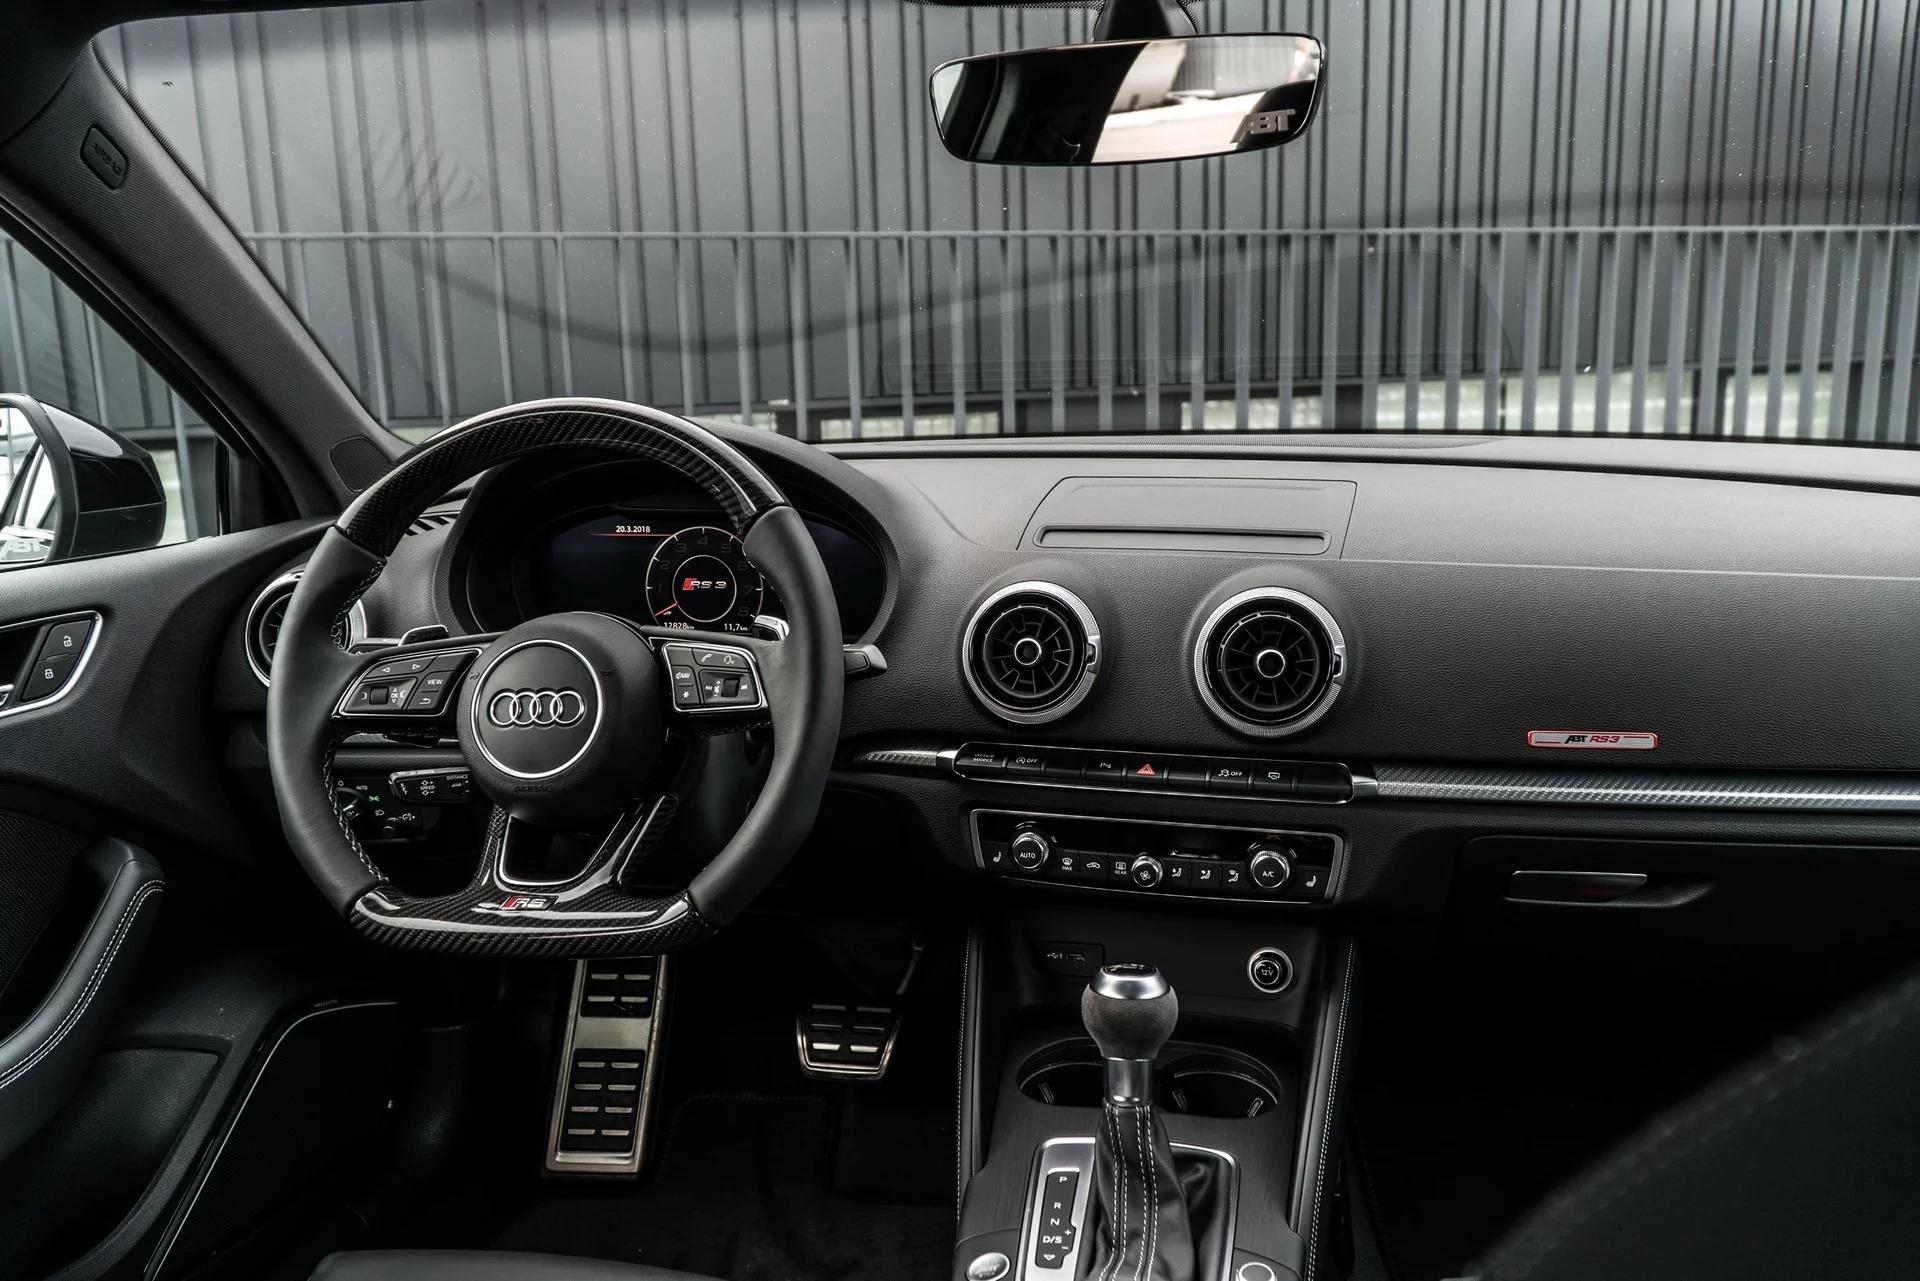 ABT Pumps Up Audi RS3 Sedan To 500 Horsepower (373 kW)